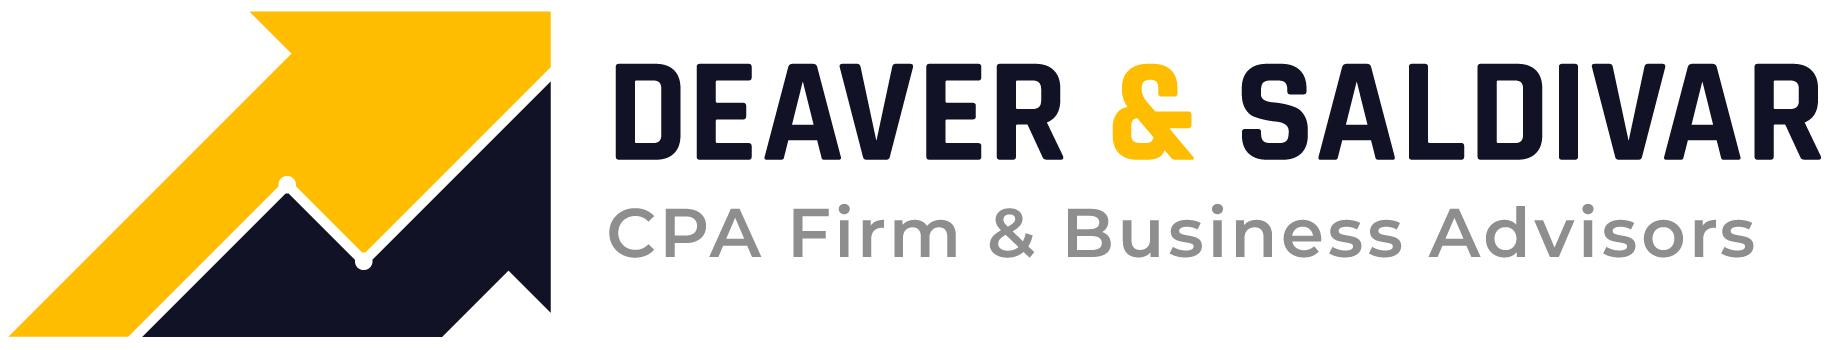 Deaver & Saldivar CPA Firm, LLC Logo